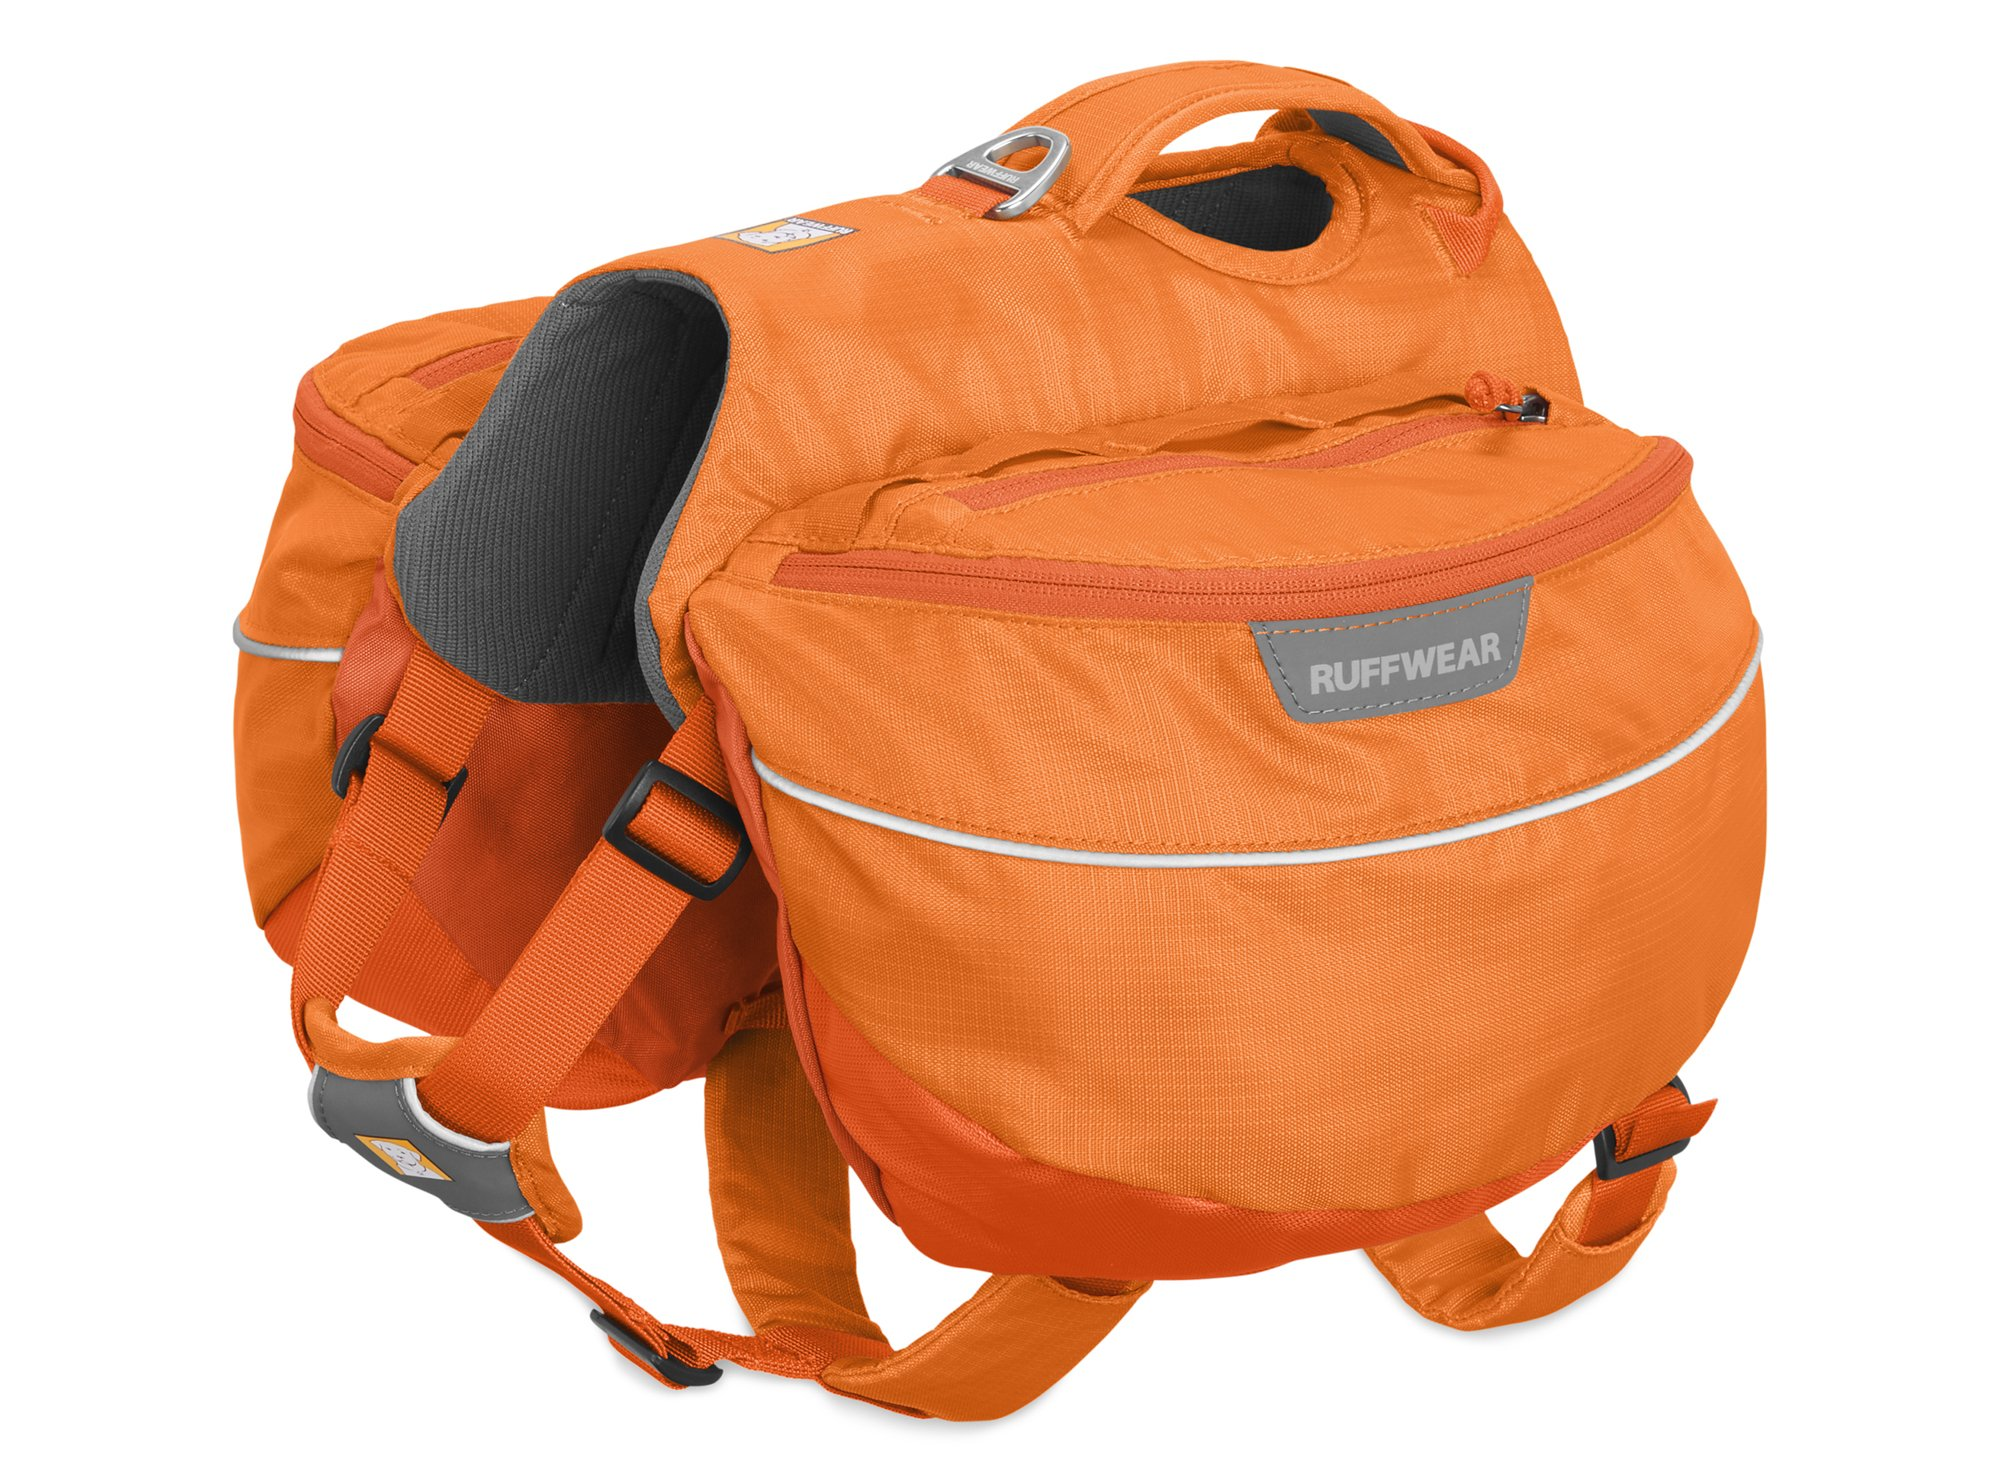 RUFFWEAR - Approach Full-Day Hiking Pack for Dogs, Orange Poppy, Medium by RUFFWEAR (Image #3)